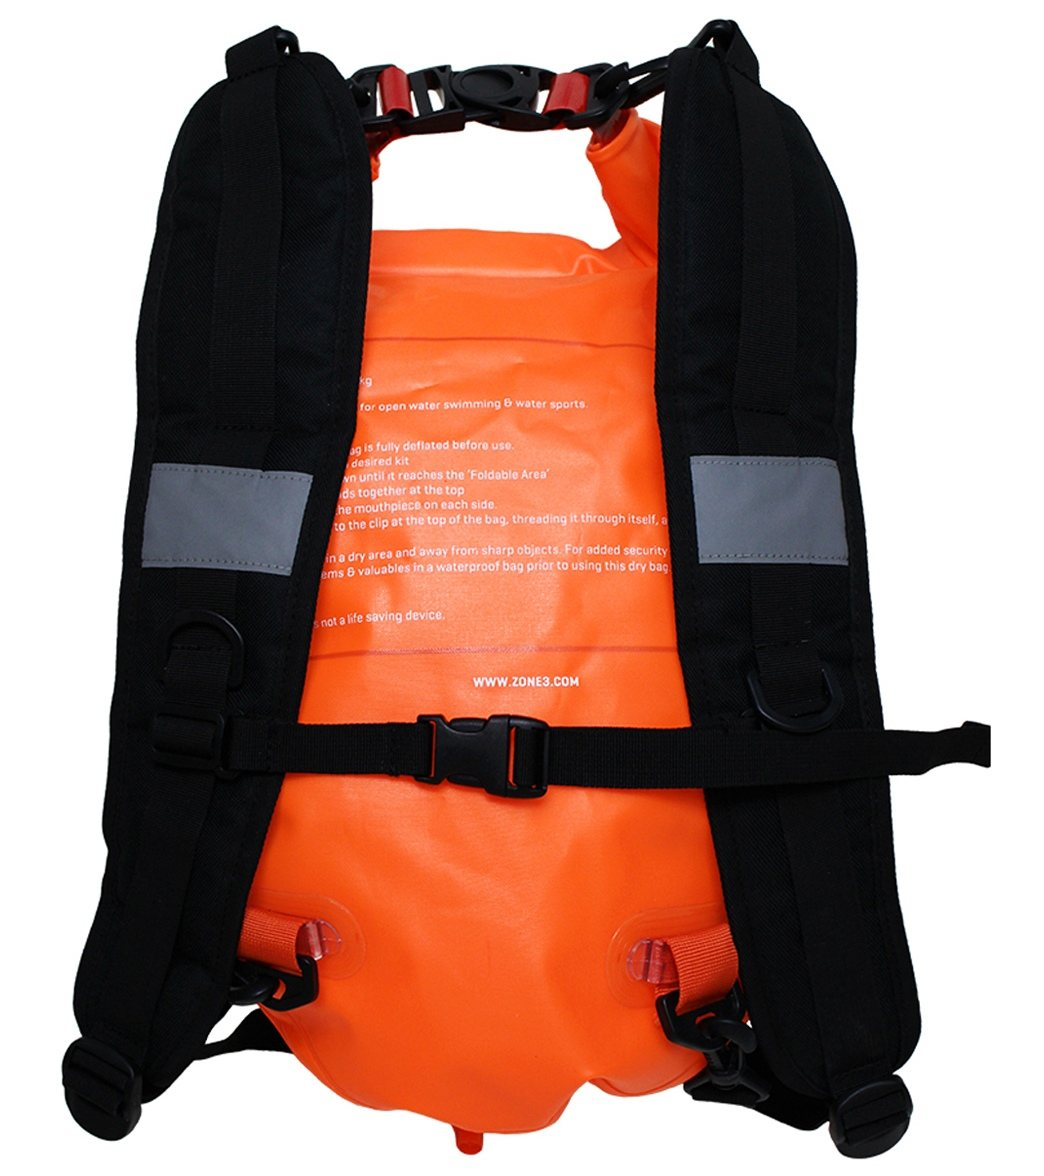 Zone 3 Swim Run Backpack Dry Bag Buoy 28l